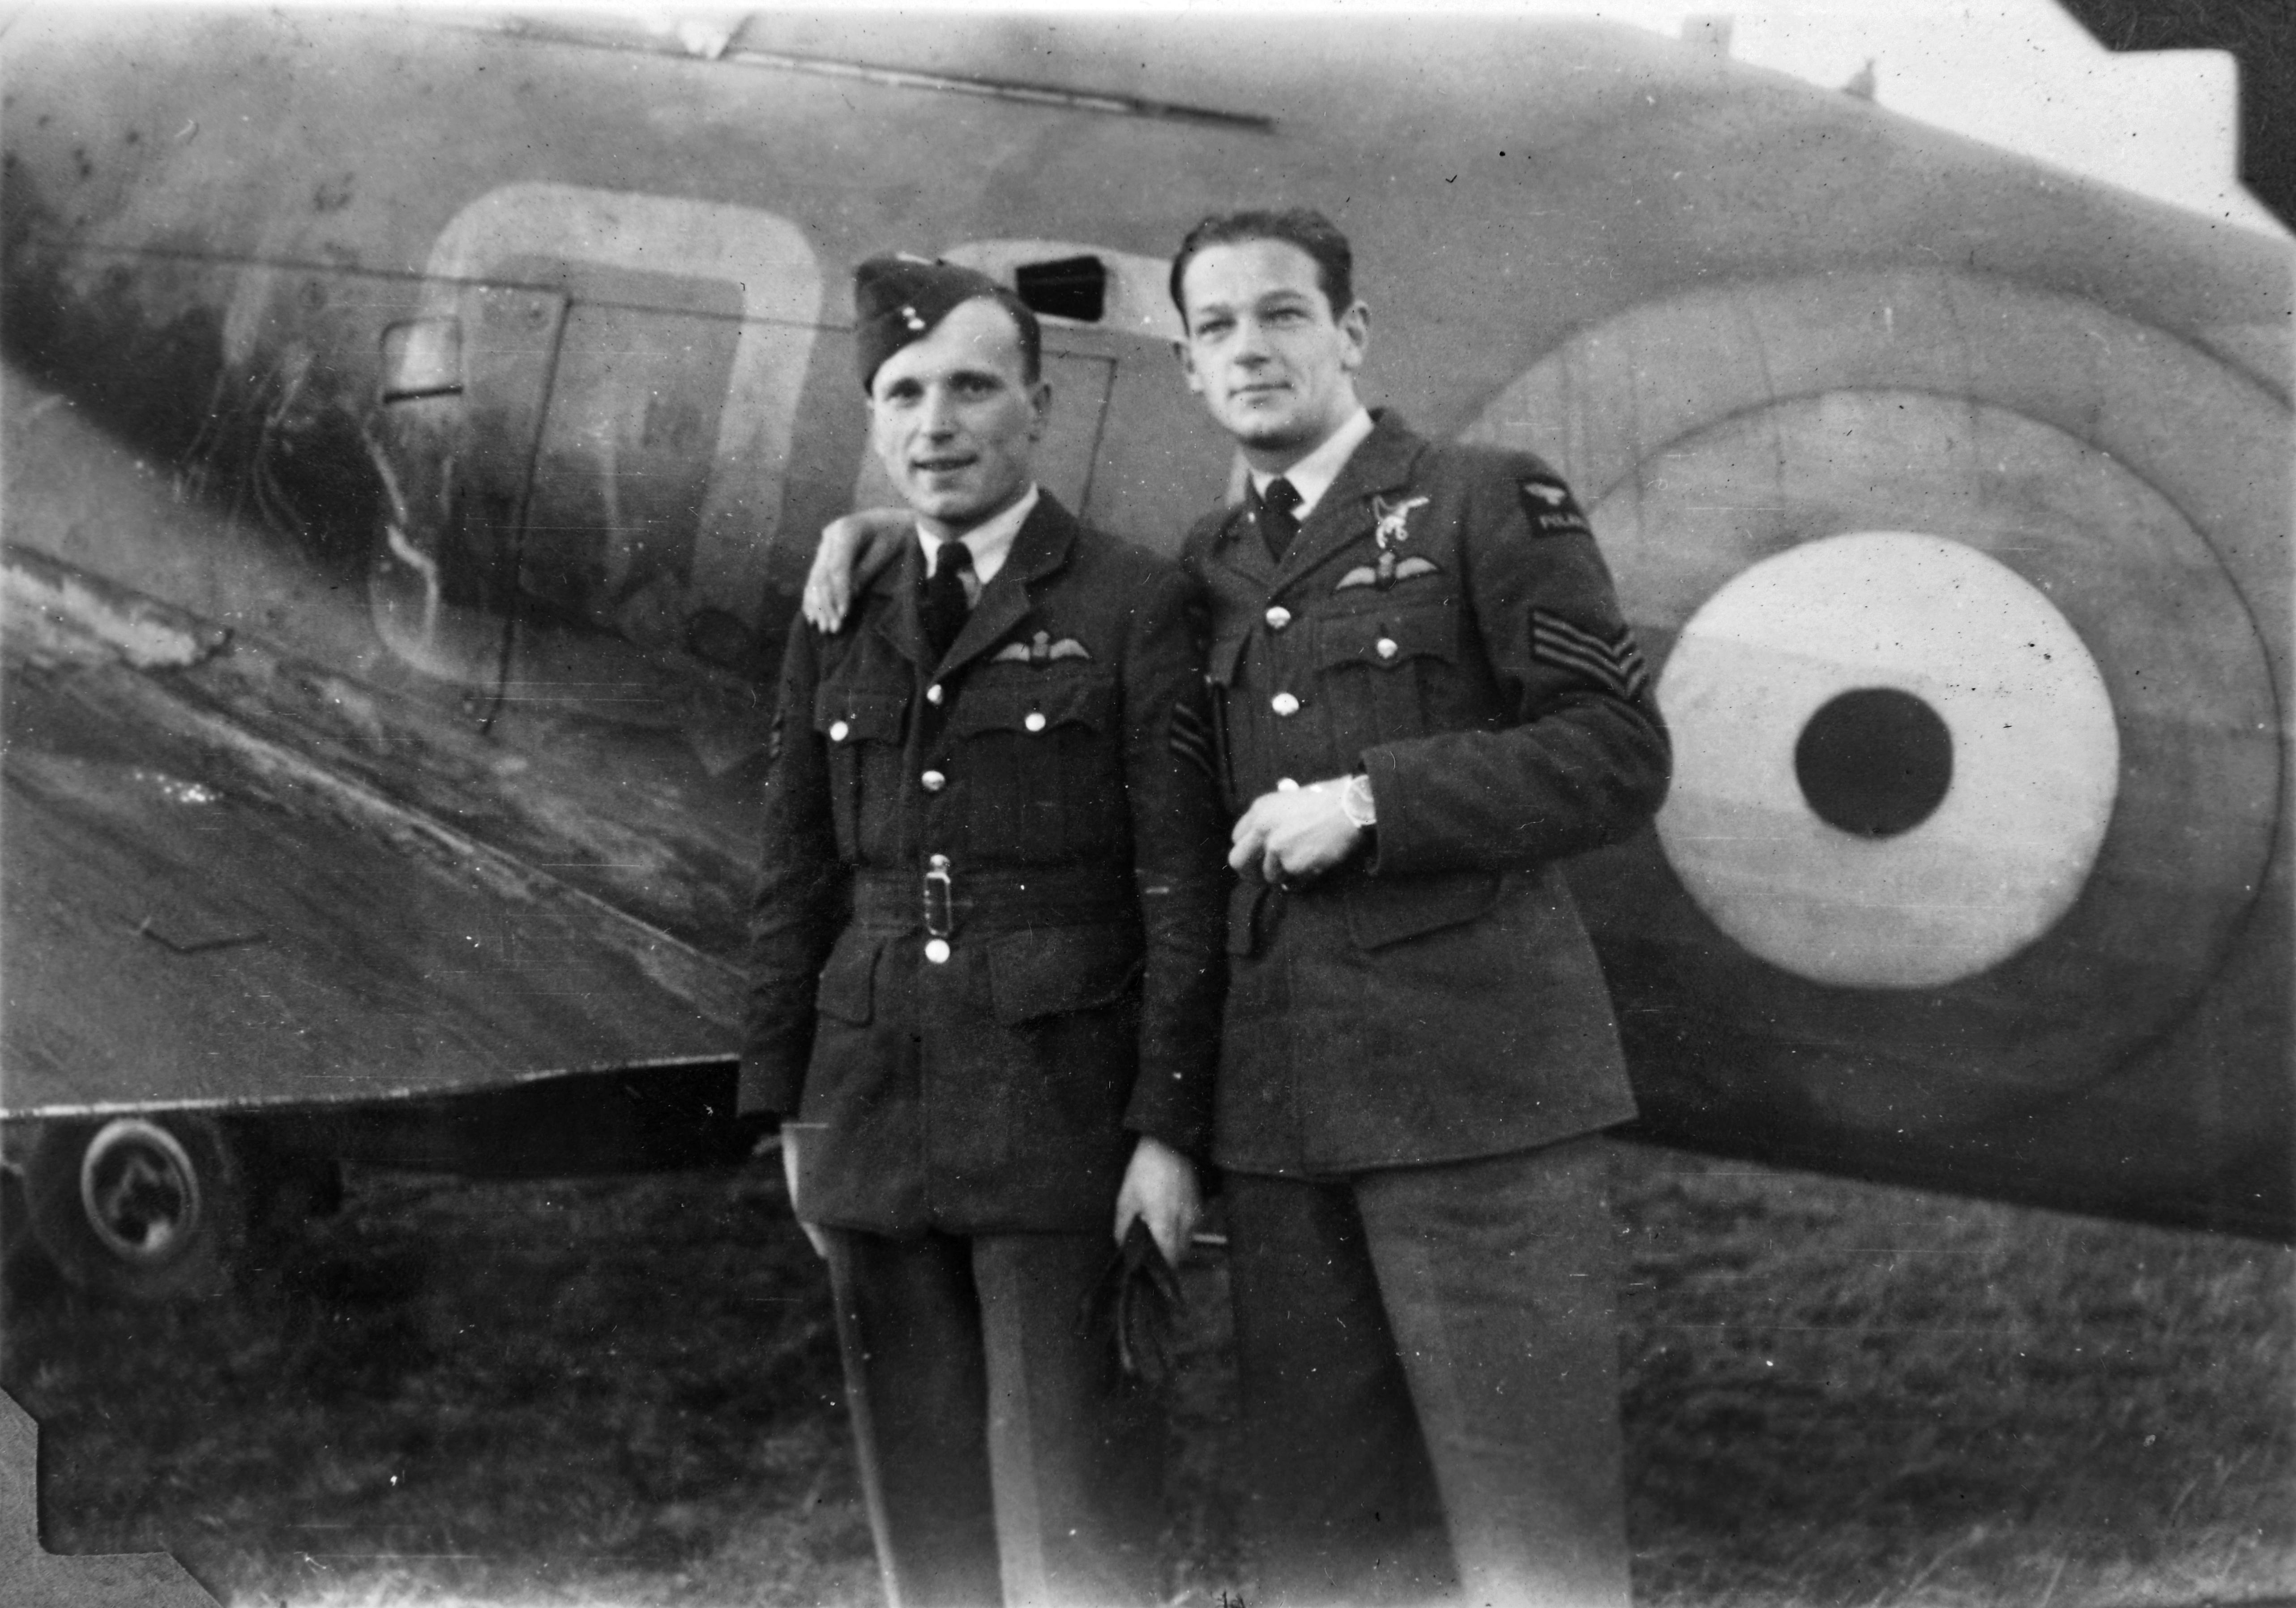 Aircrew RAF 3Sqn Sgt Jozef Biel (L) and Sgt Pawel Piotr Gallus (R) with a Hurricane at Castletown 01